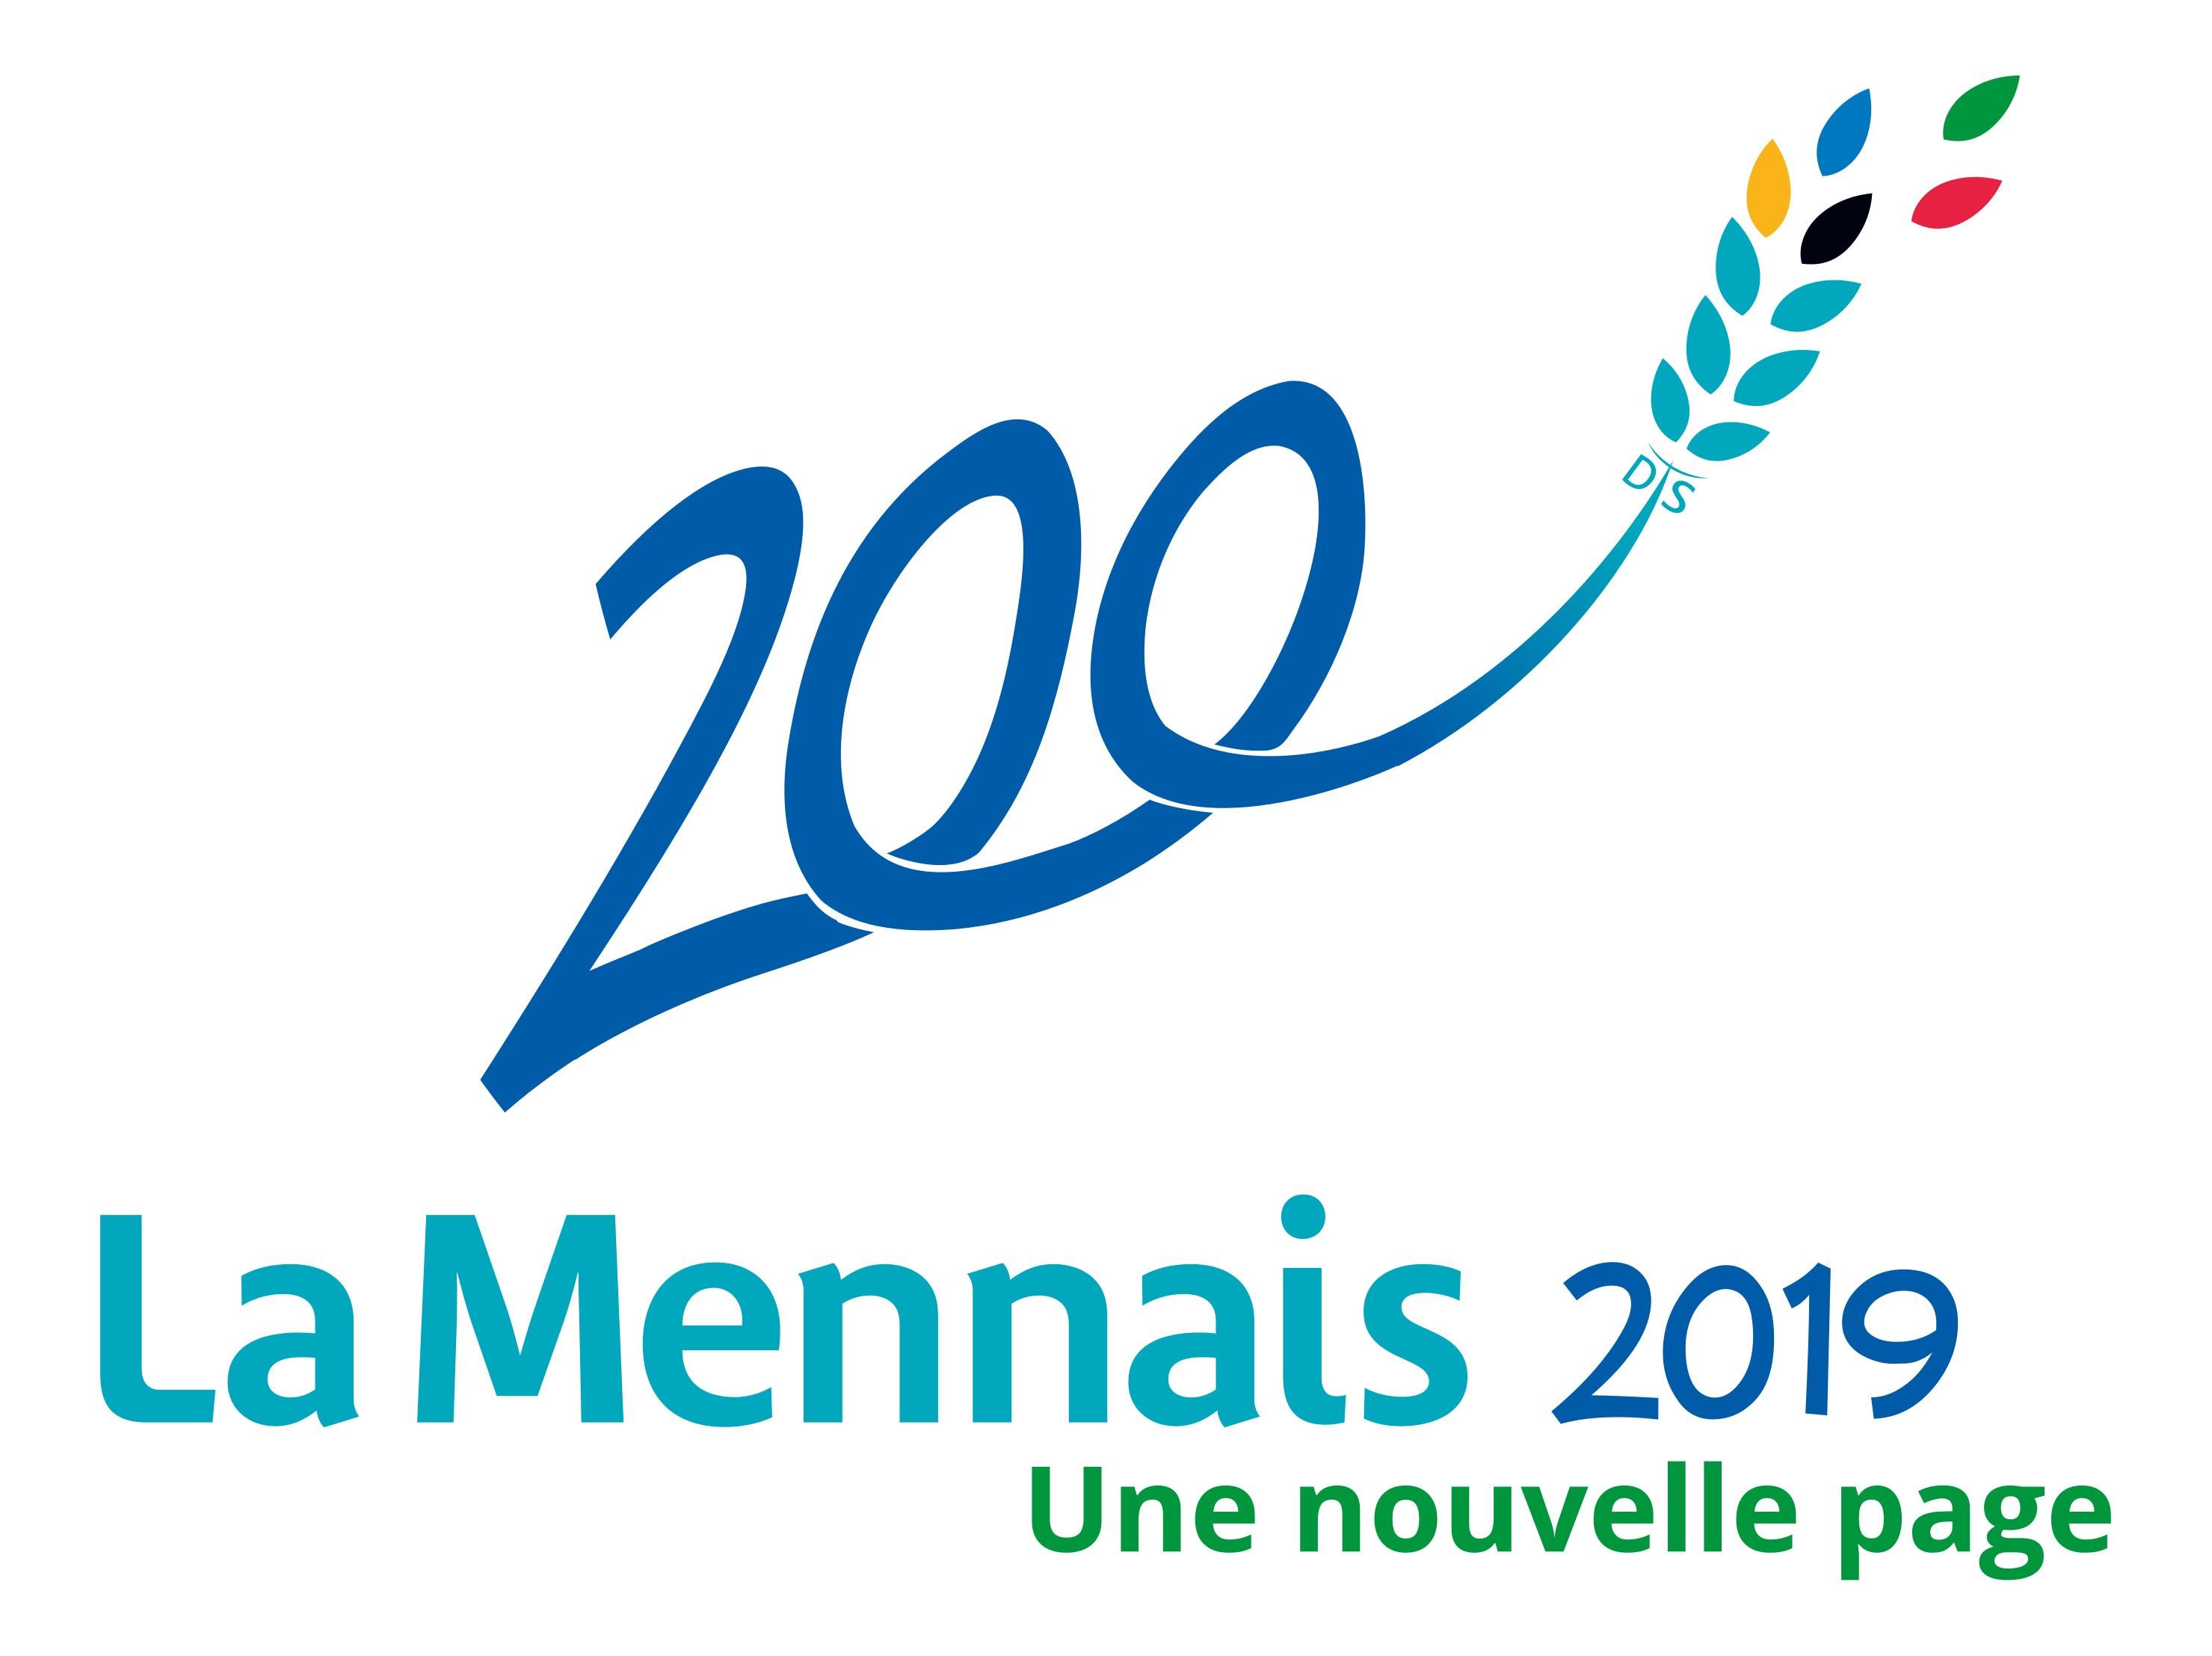 200-LaMennais2019_FR-rgb